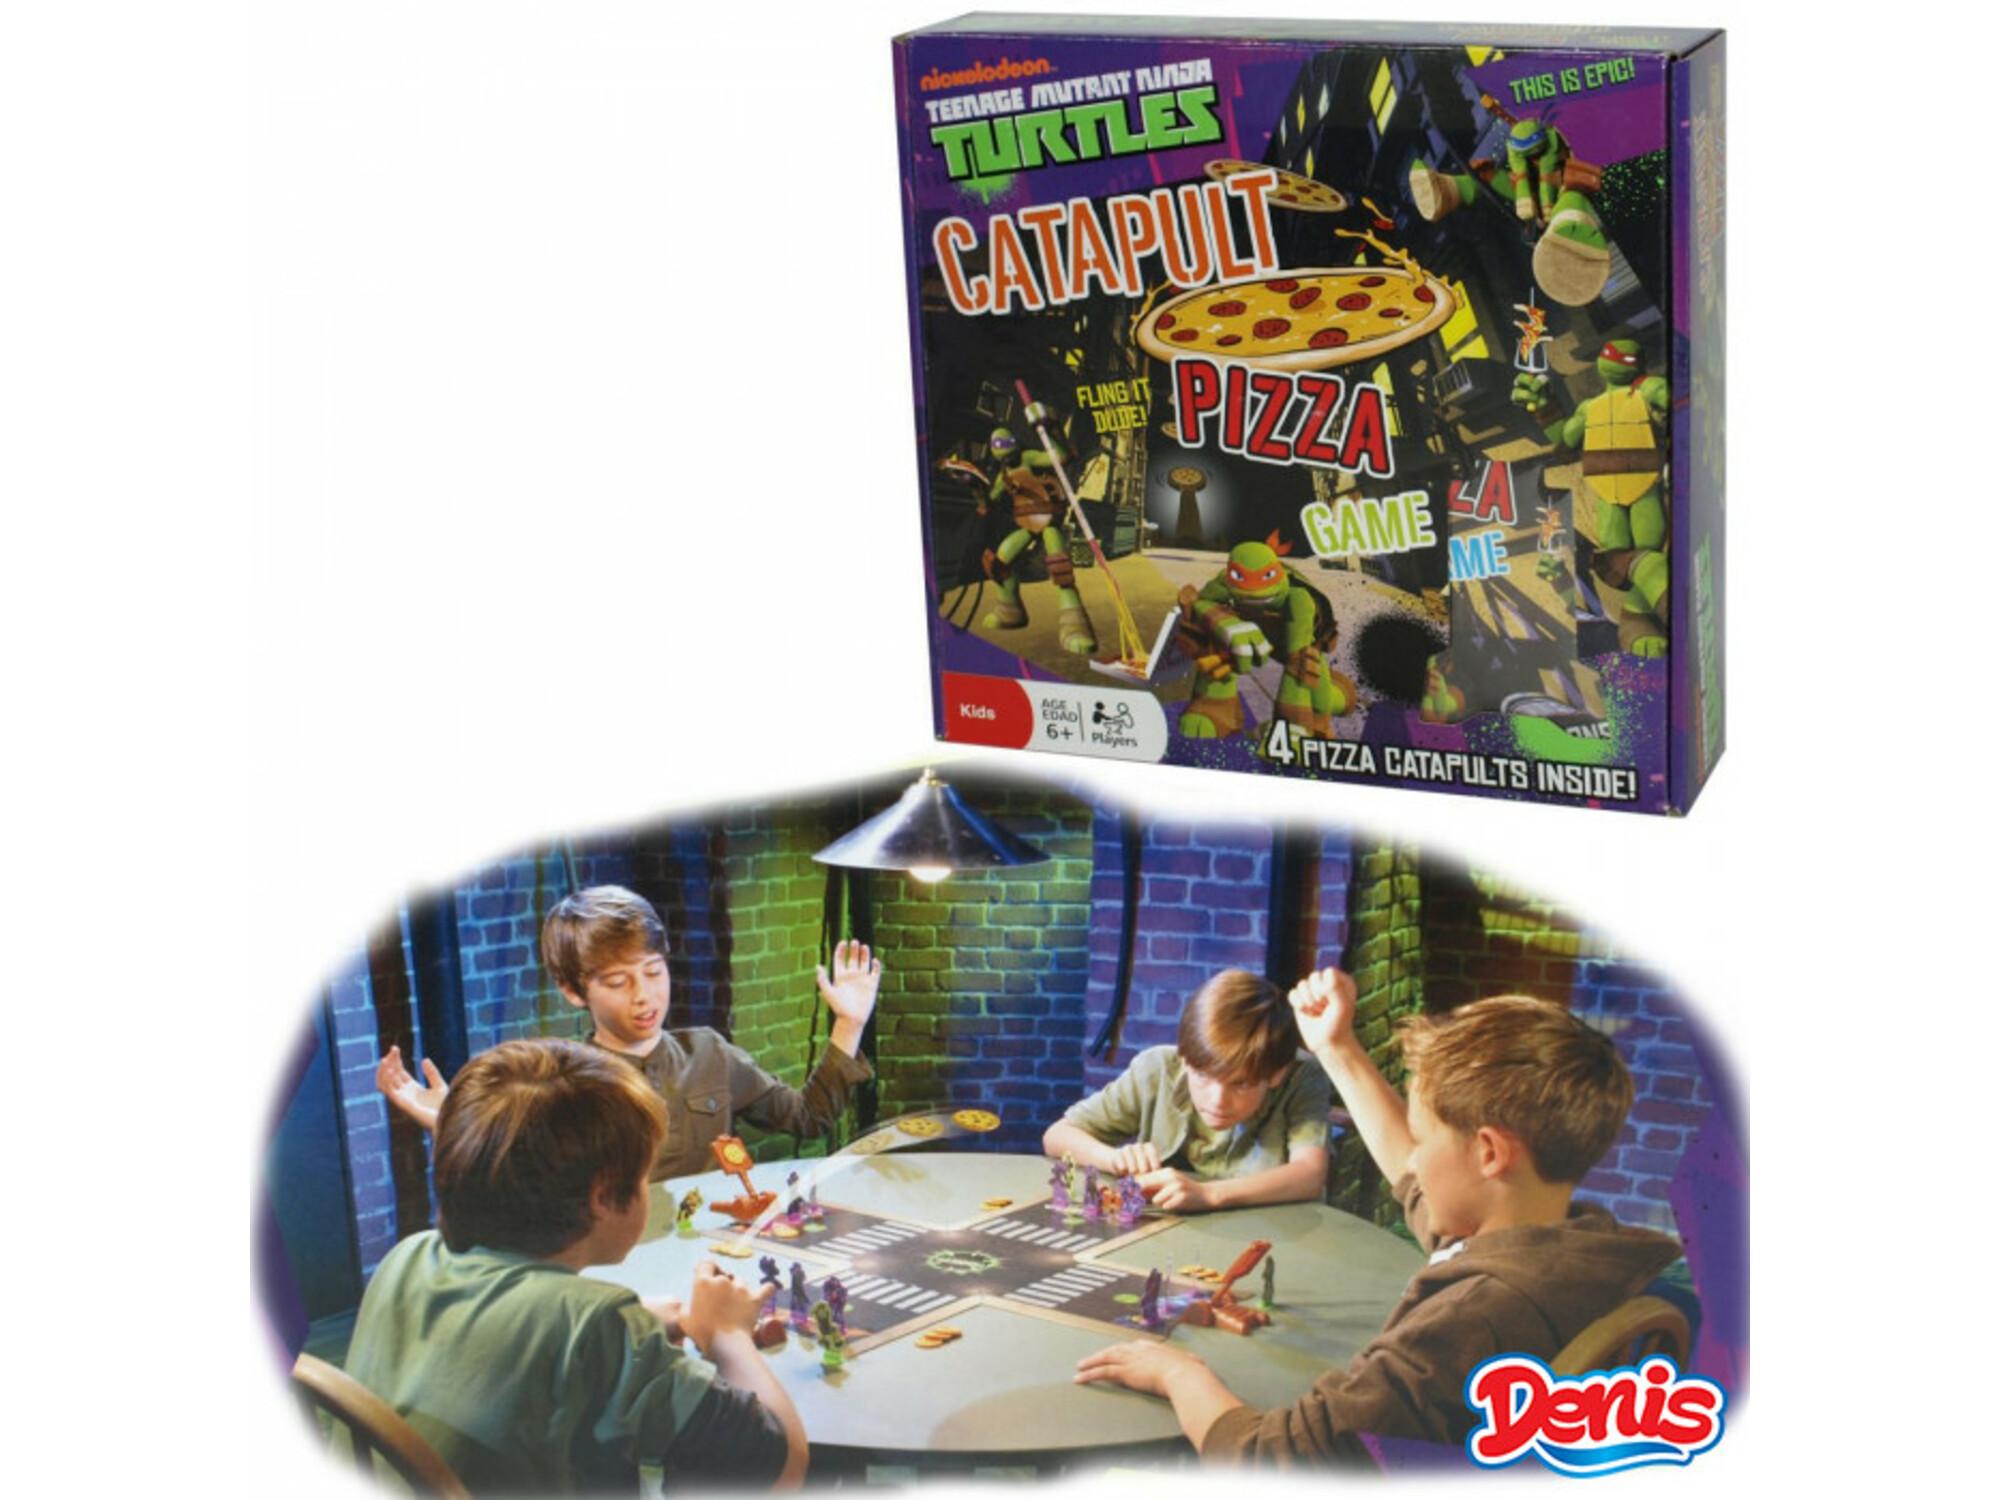 TMNT Catapult Pizza Game 05-932000